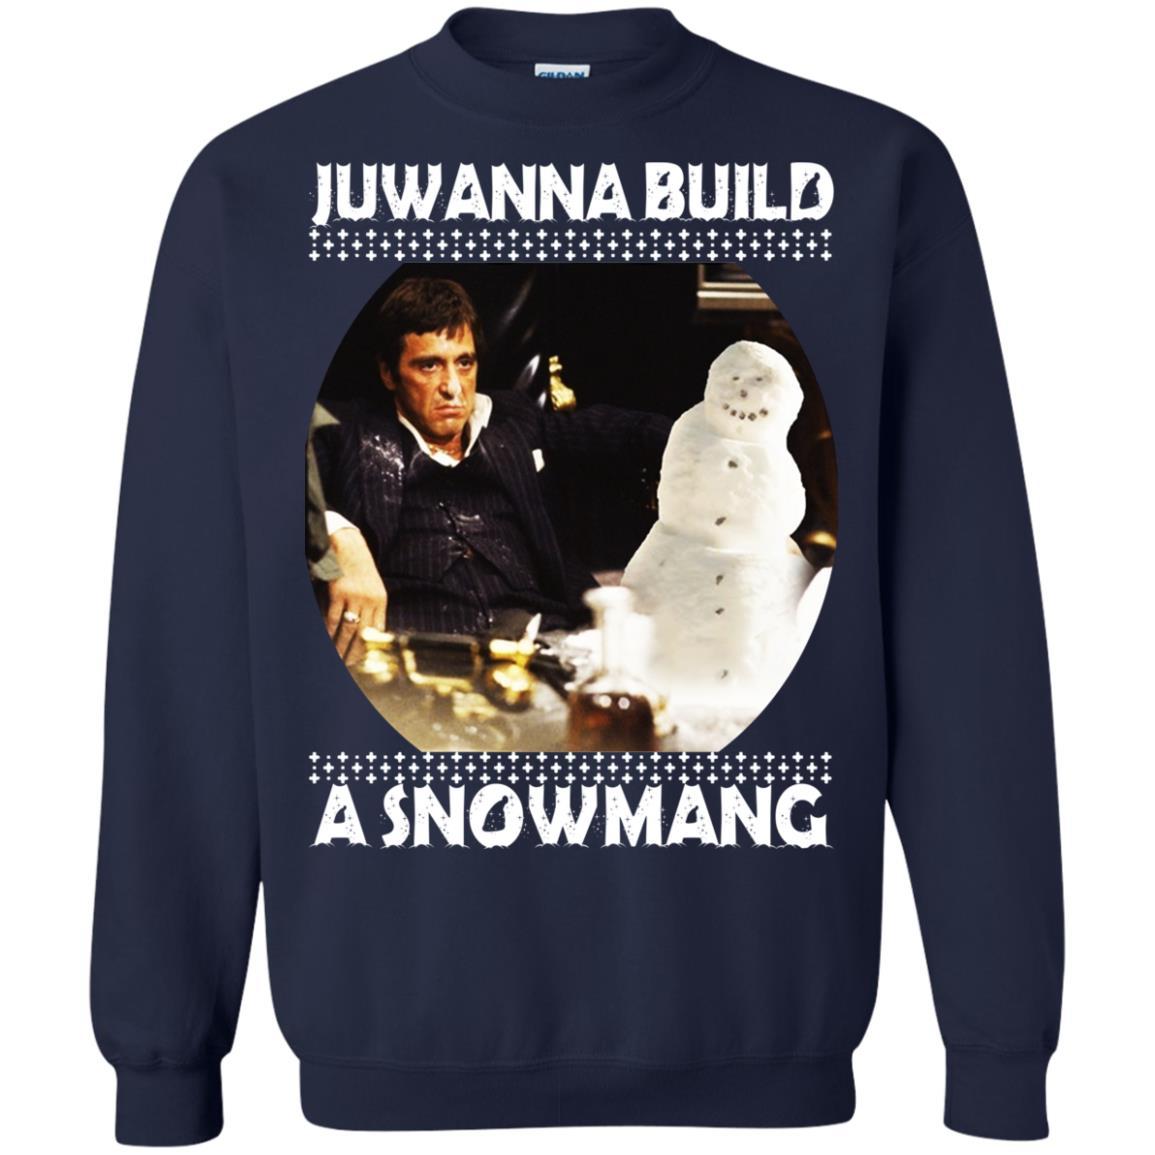 image 6337 - Scarface Juwanna Build a Snowman Christmas Sweater, Hoodie